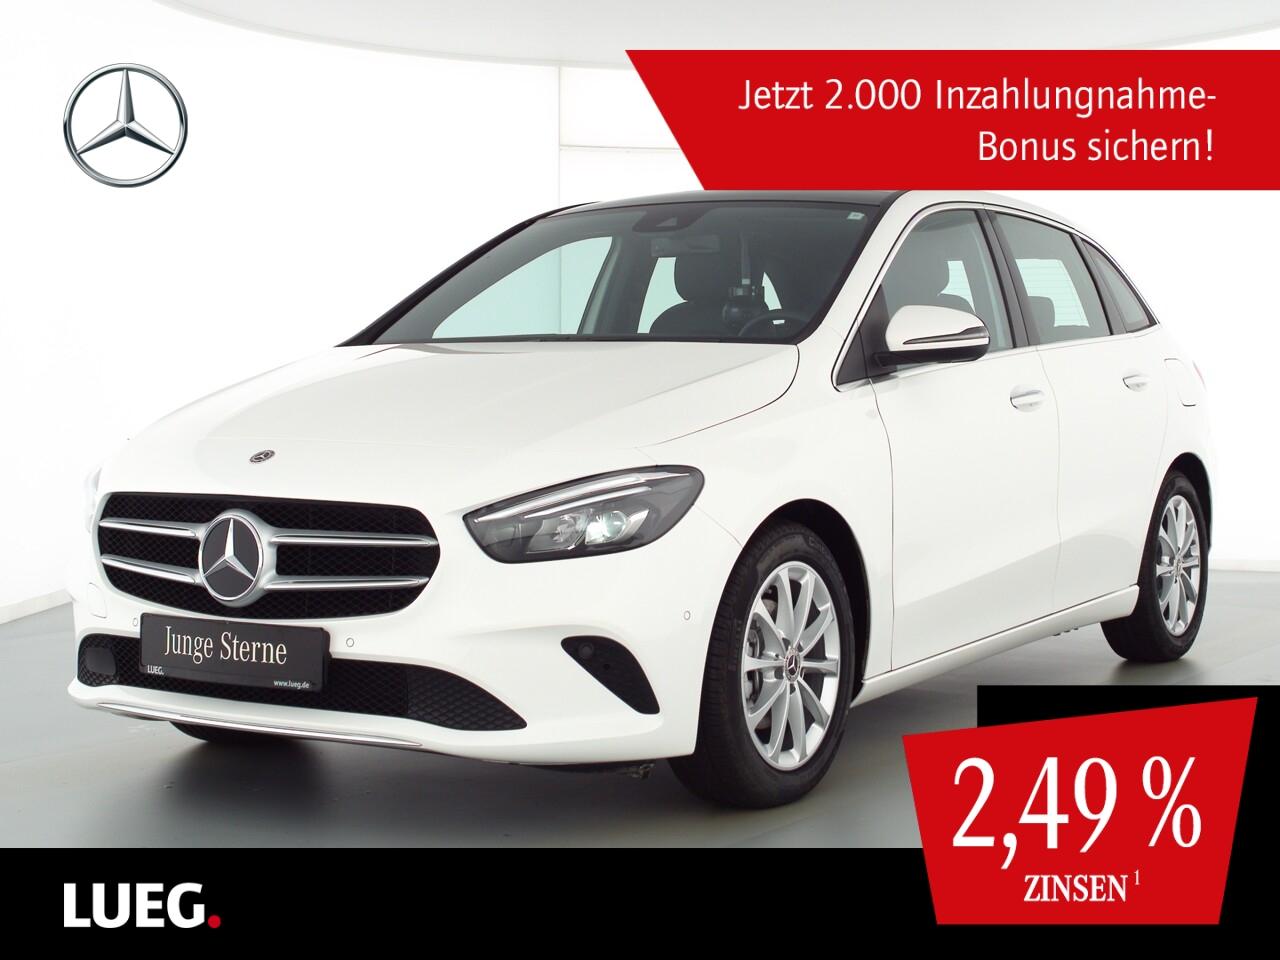 Mercedes-Benz B 180 d Progressive+MBUX+NavP+Pano+LED+Sthzg+RFK, Jahr 2020, Diesel